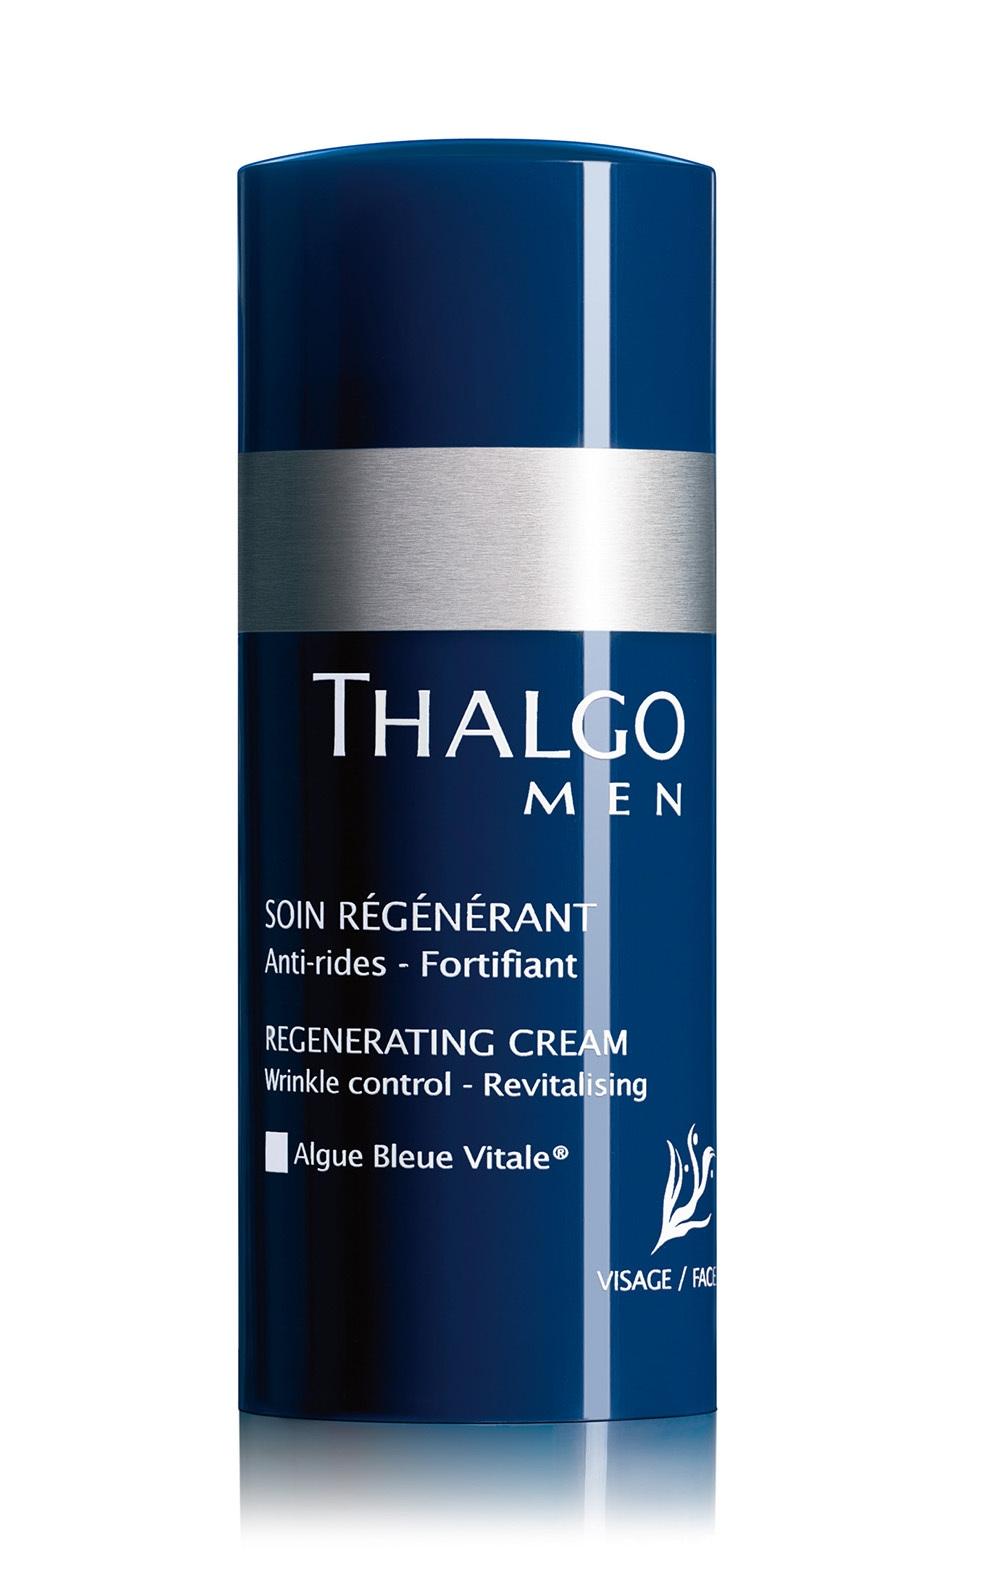 Thalgo Тальгомен восстанавливающий крем Regenerating Cream, 50 мл